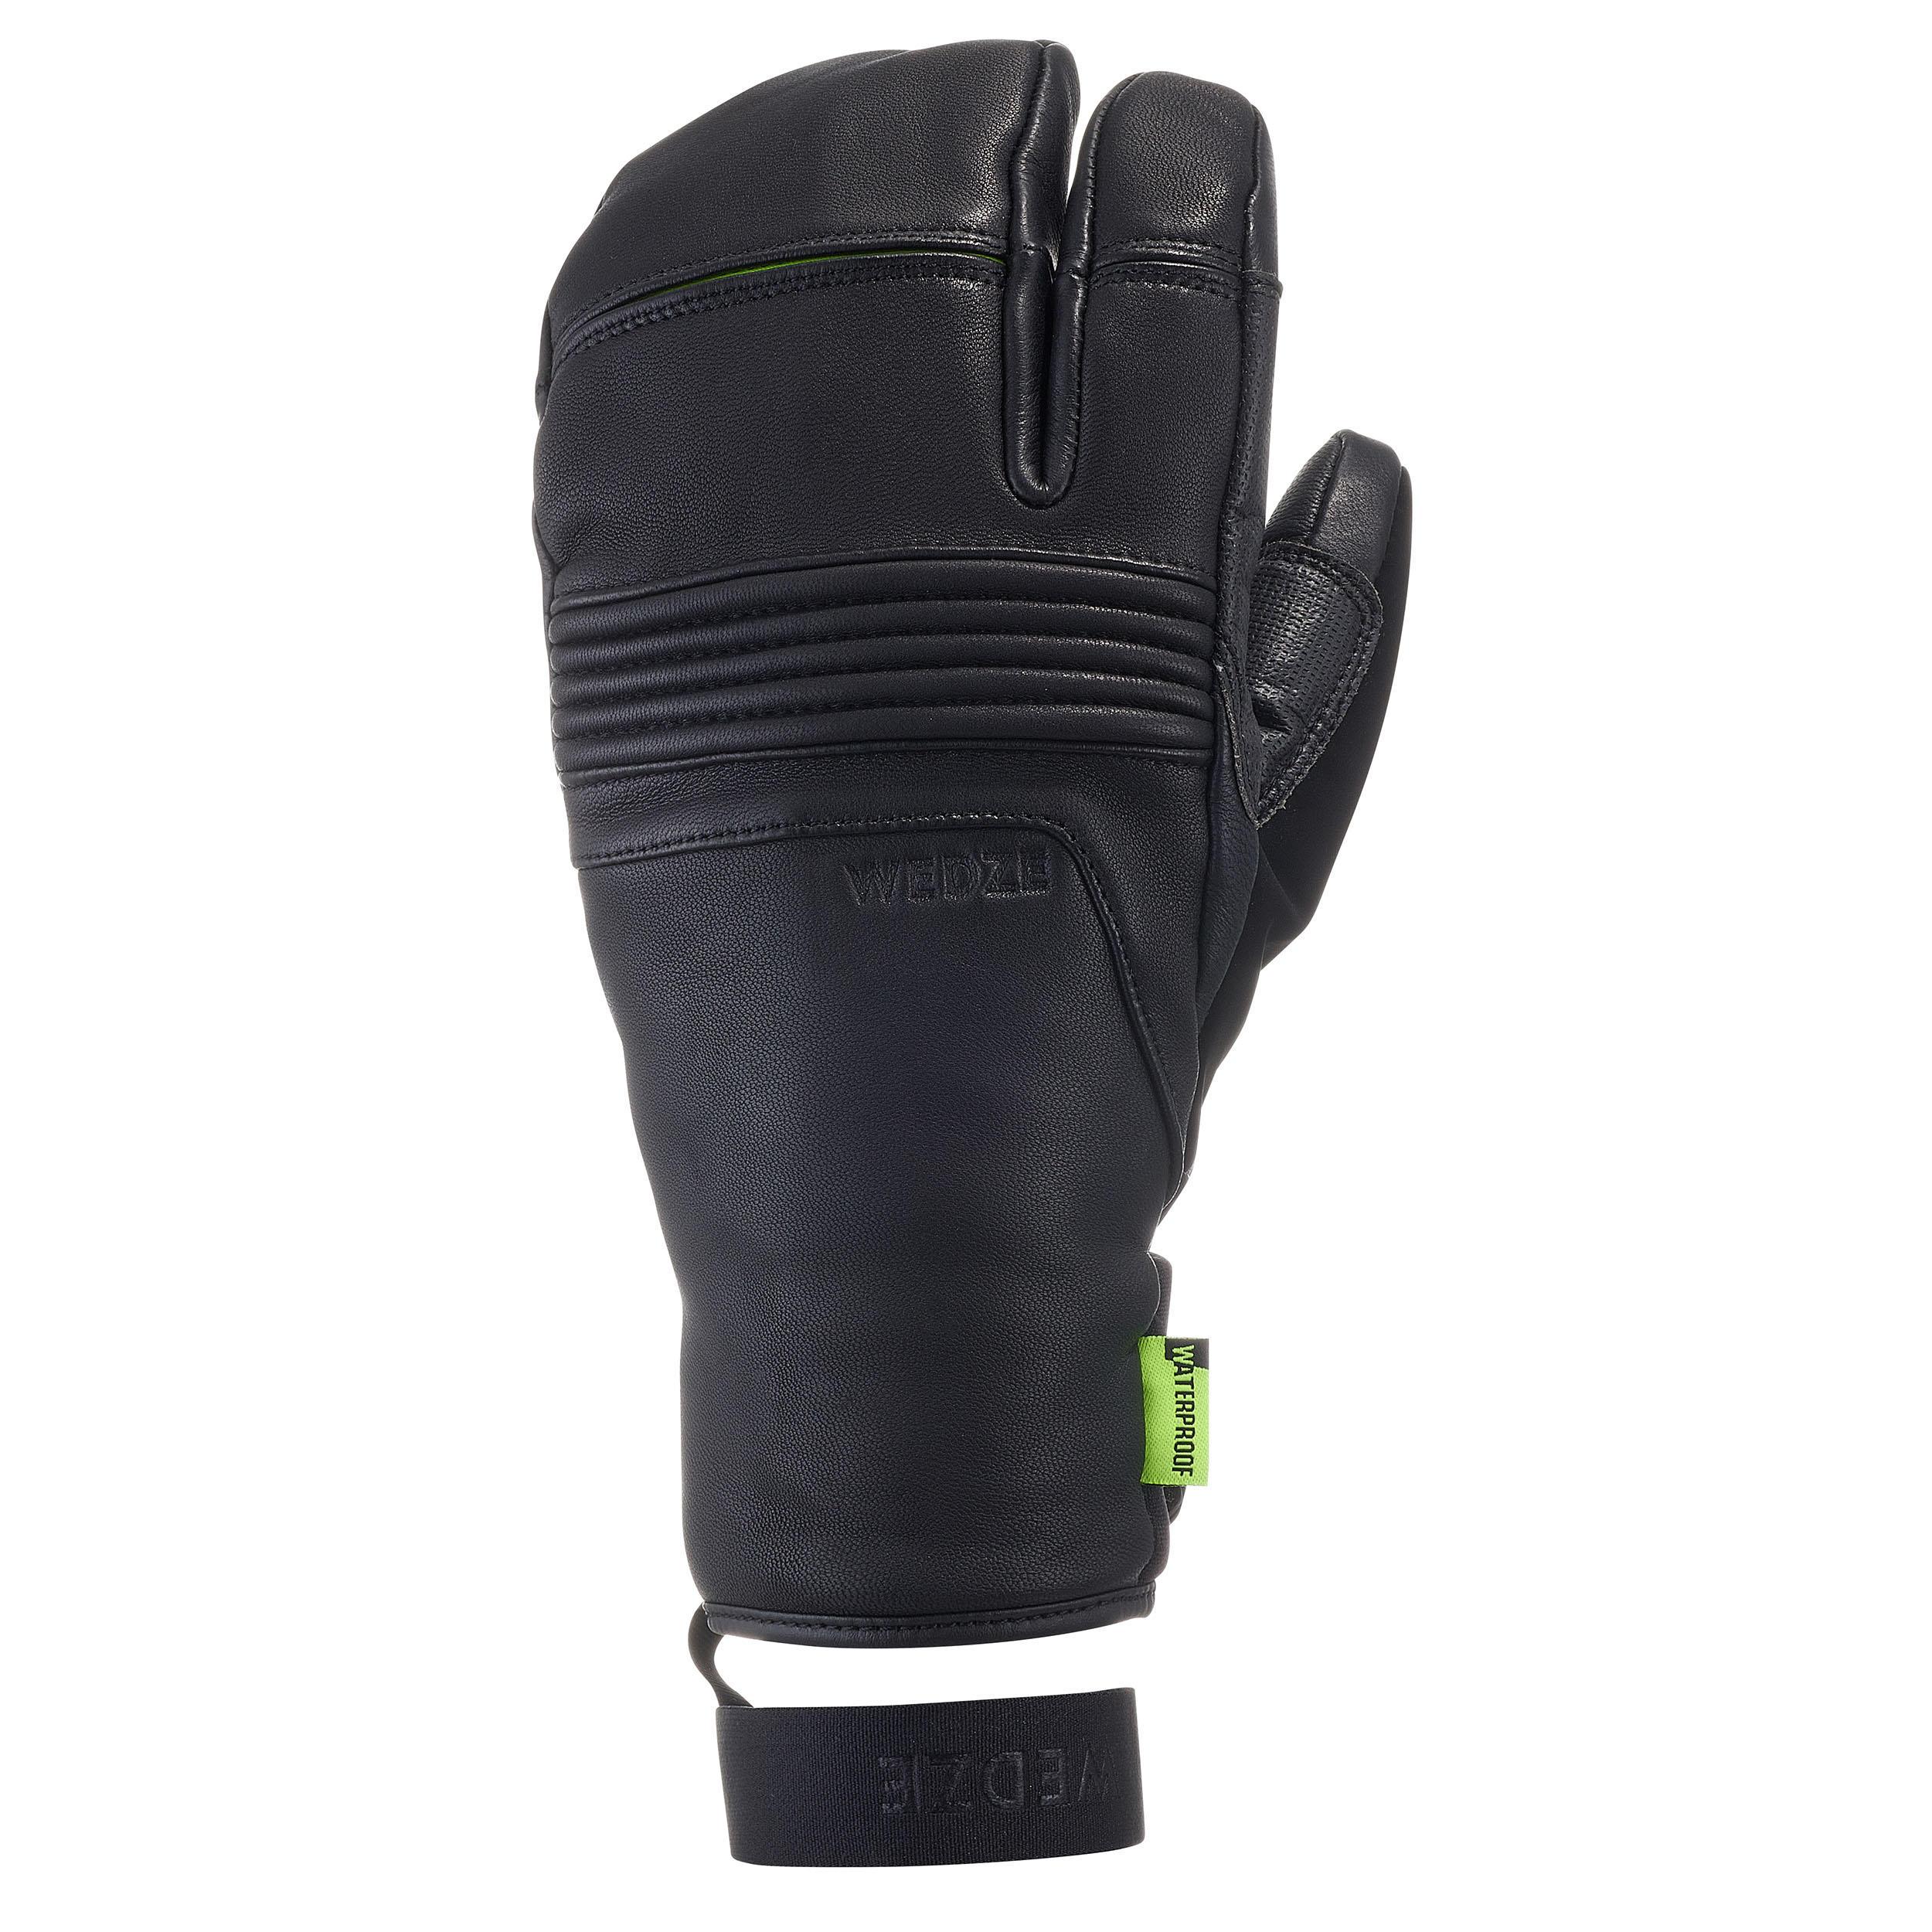 Mănuși schi LBS 900 Negru